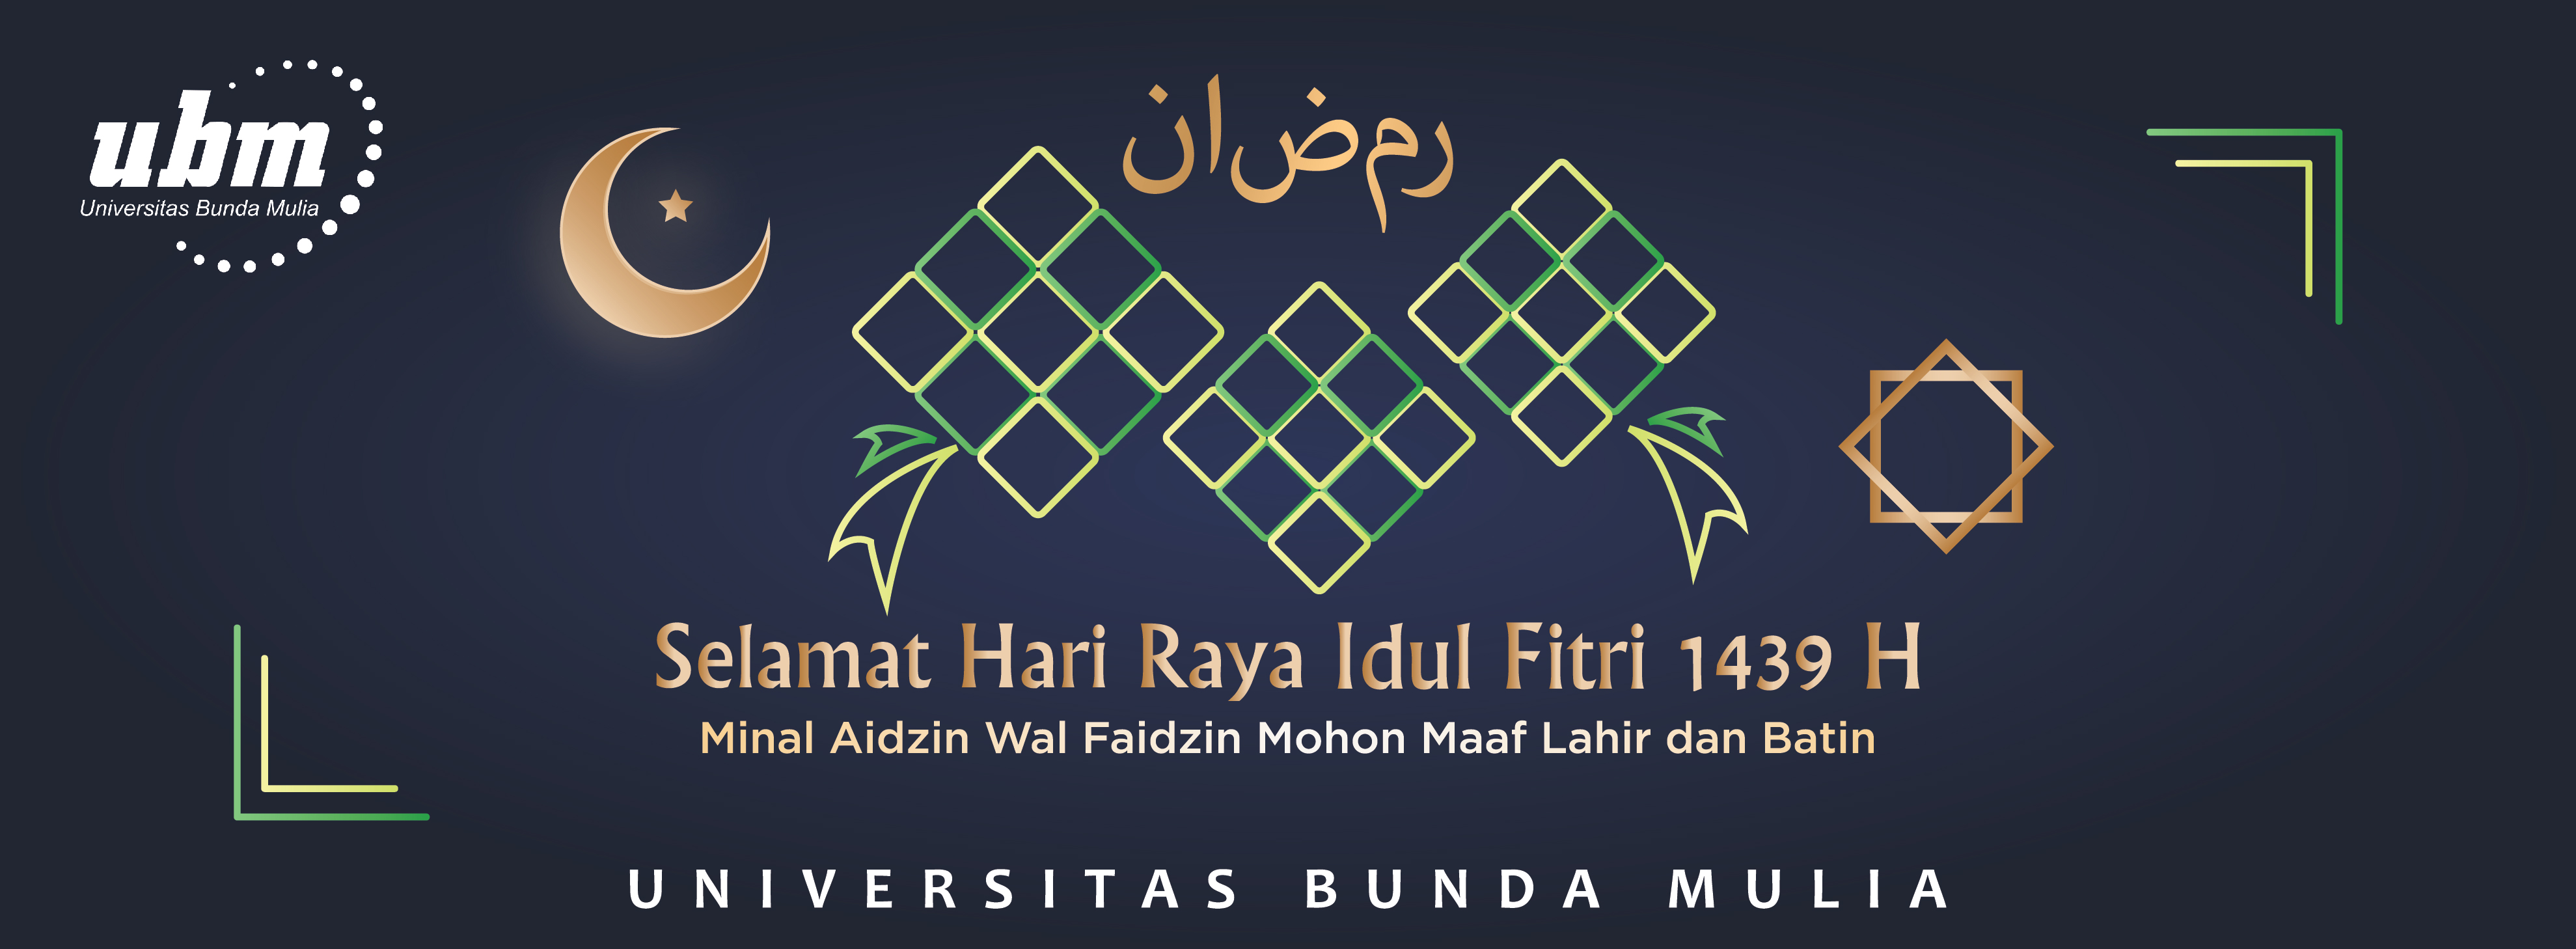 Web-Banner-Hari-Raya-Idul-Fitri-01